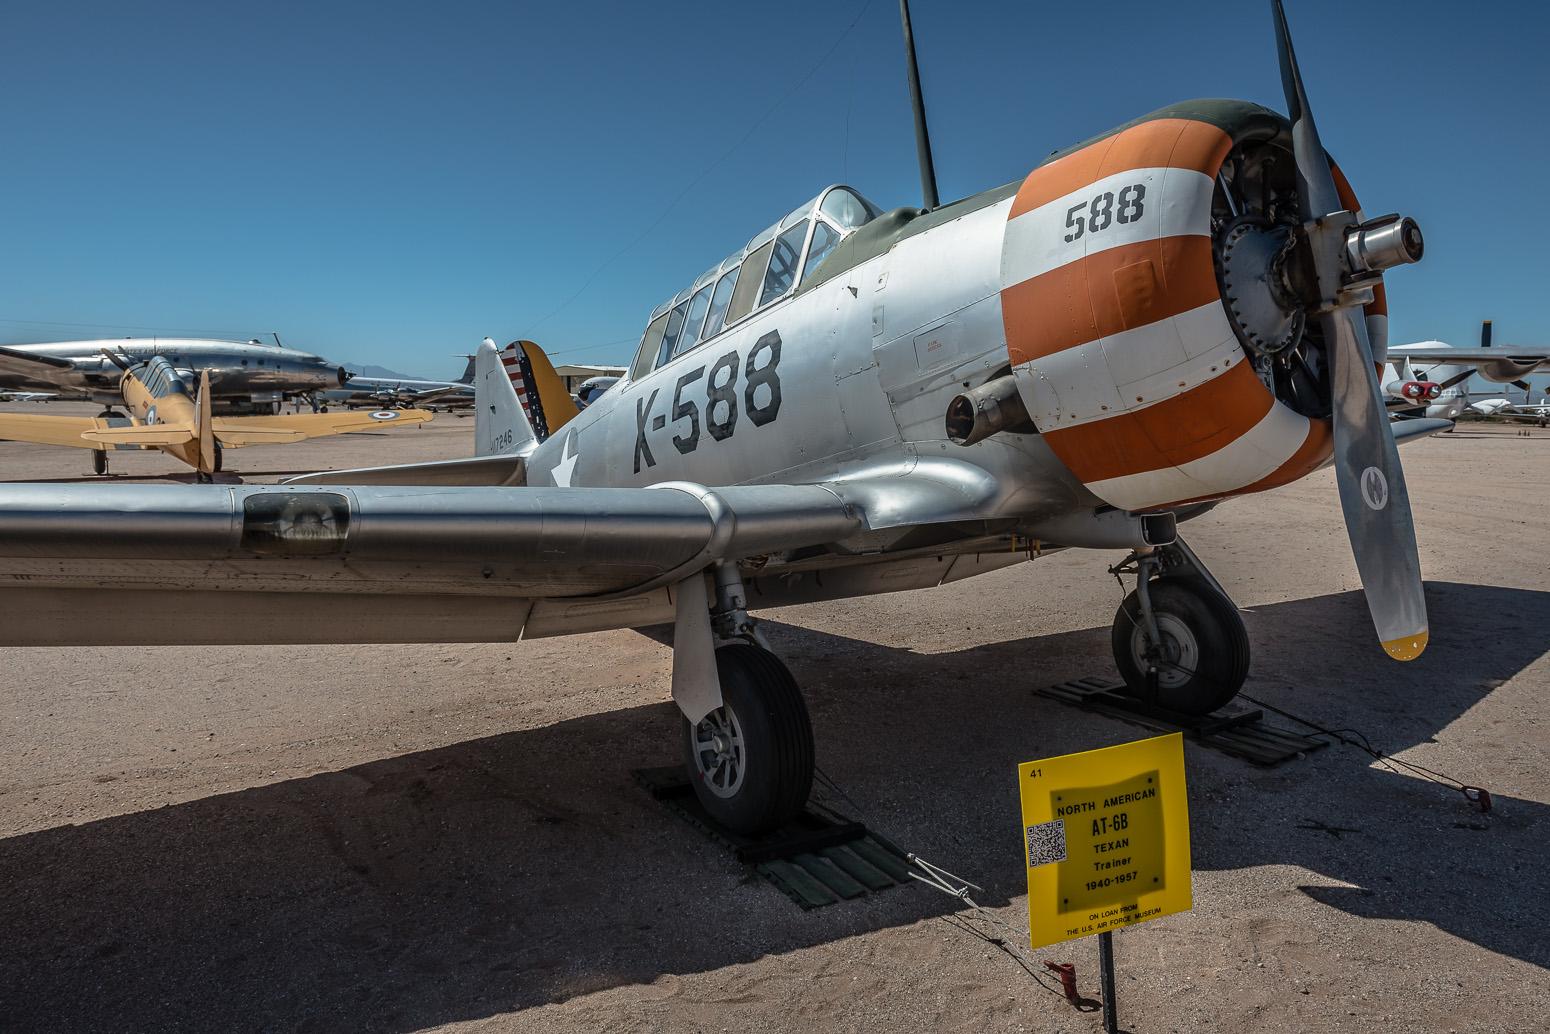 North Americain AT-6B, Pima Air & Space Museum, Tucson, USA